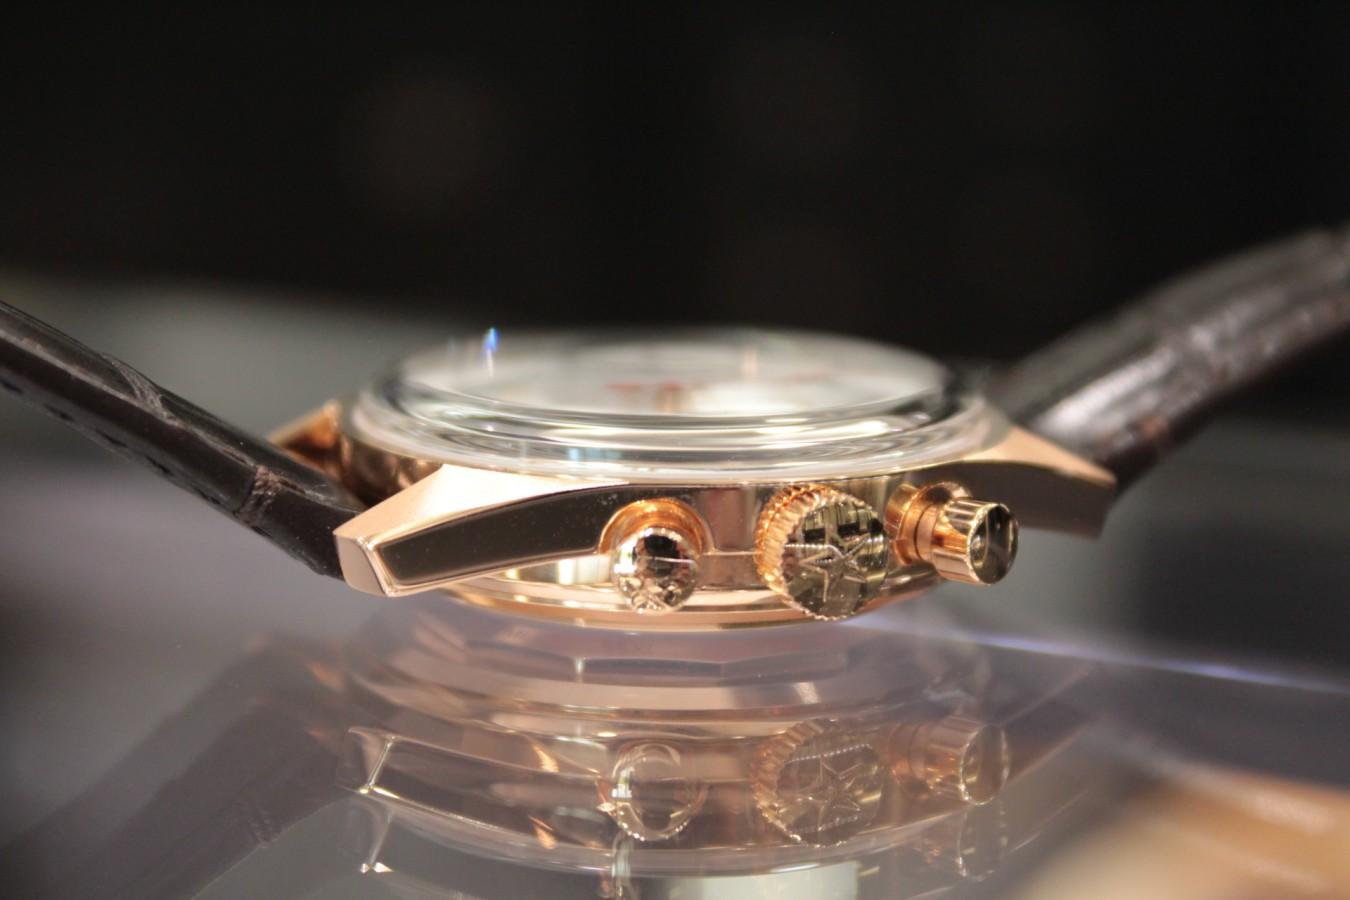 IMG_3325 世界50本限定の超希少モデル【A386 REVIVAL】 - CHRONOMASTER